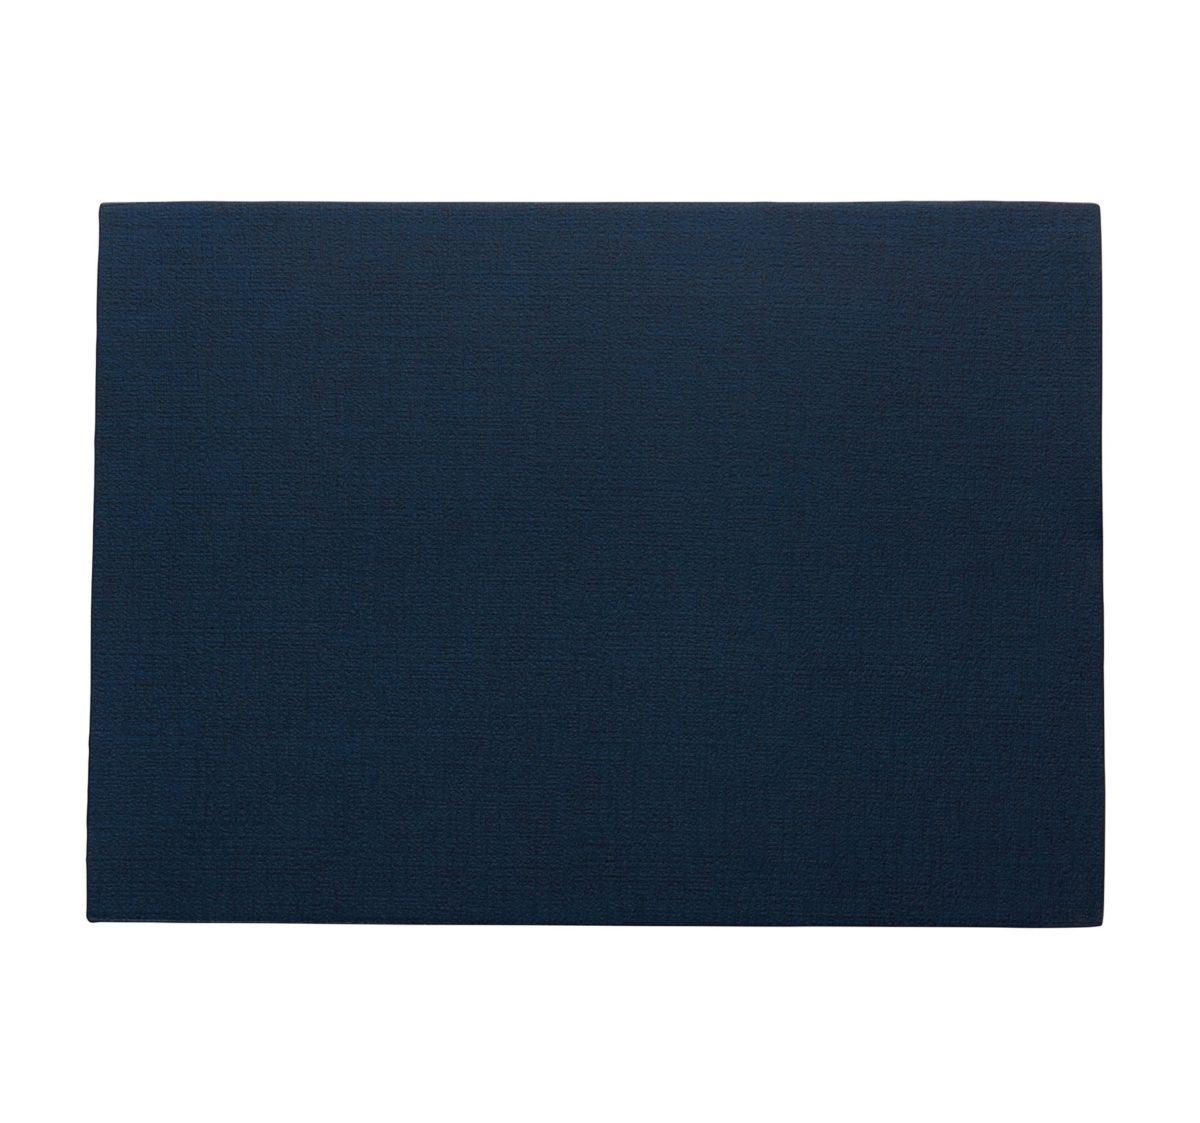 78200076 meli melo 1200x1123 - Placemat meli-melo midnight blue 46*33 cm (78200076)